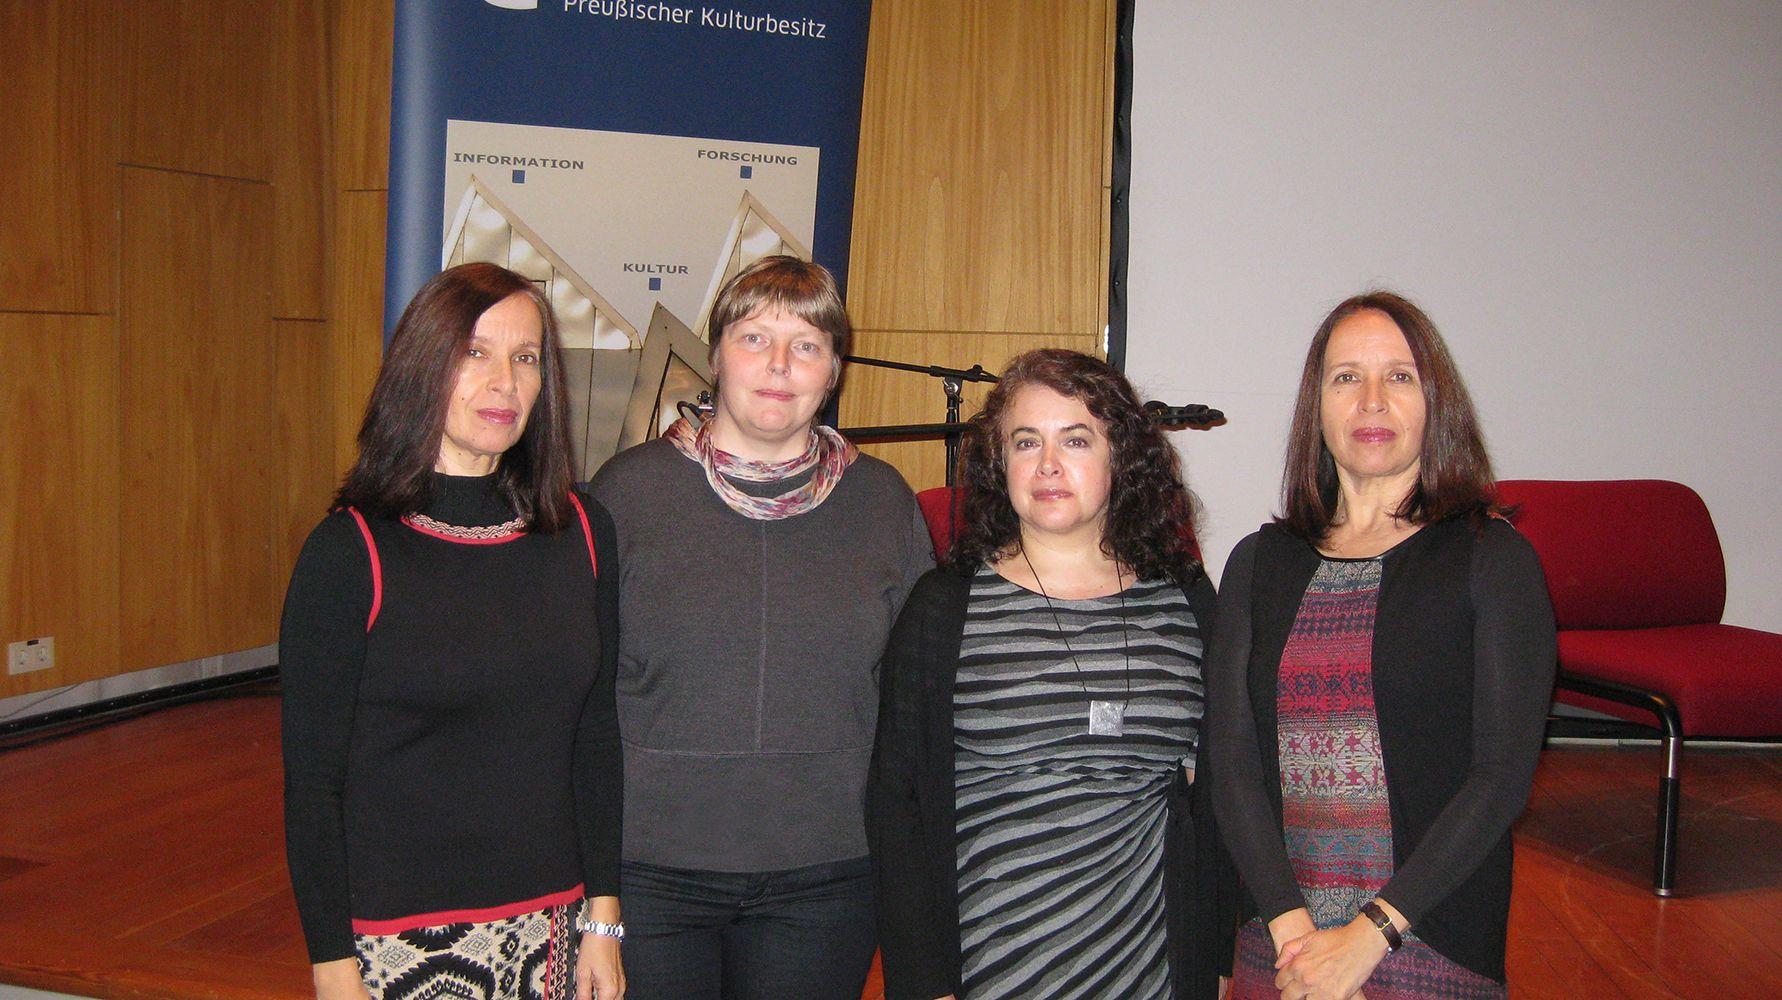 Tres-Mujeres-Lindas.-Estreno-Instituto-Iberoamericano-Berlín.-Poseck-Films